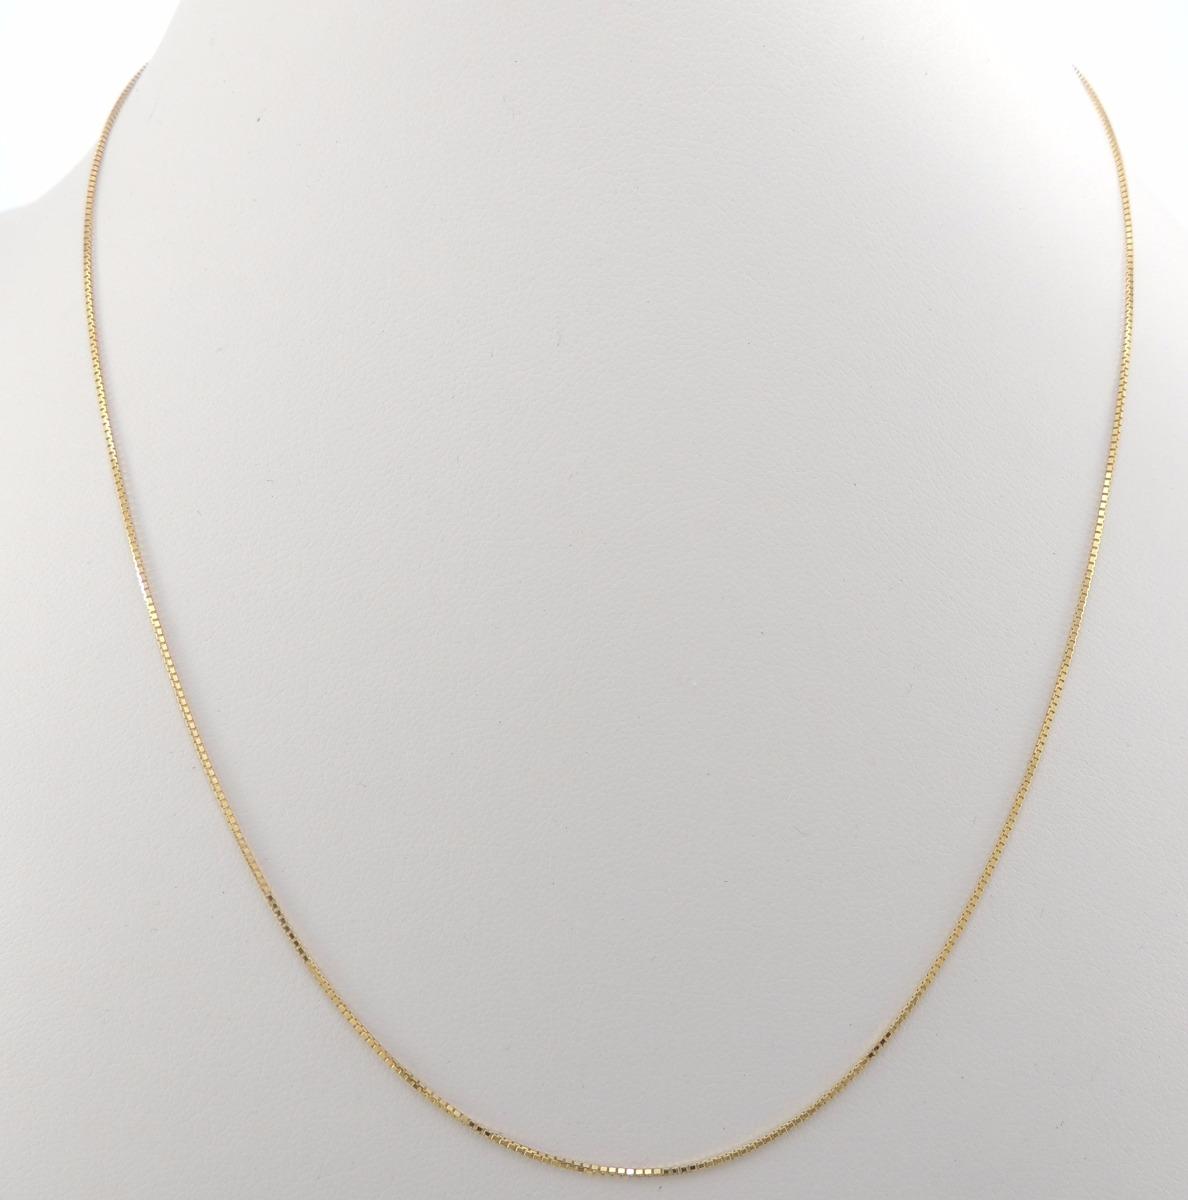 corrente feminina veneziana 1 gargantilha 40 cm ouro 18k. Carregando zoom. 5e6cfb53d6